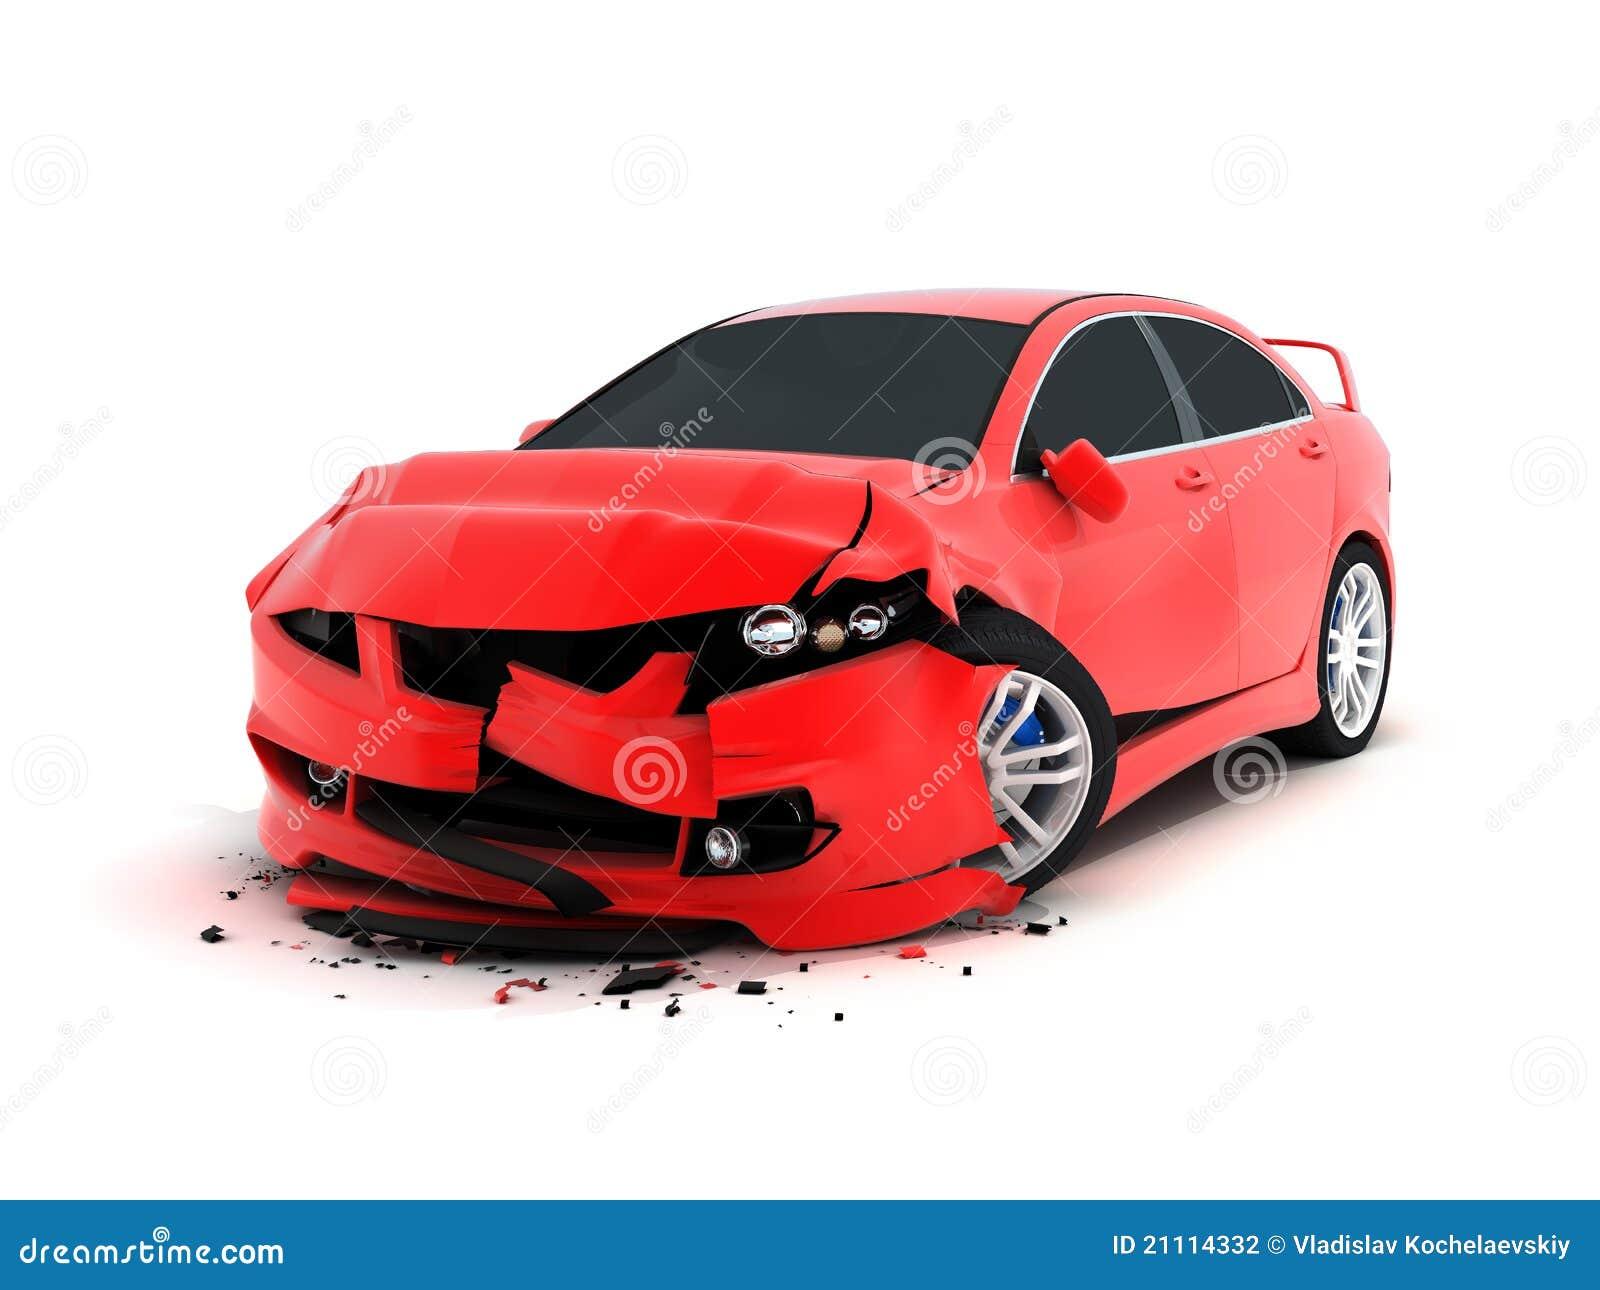 That Car Crash Was So Metal